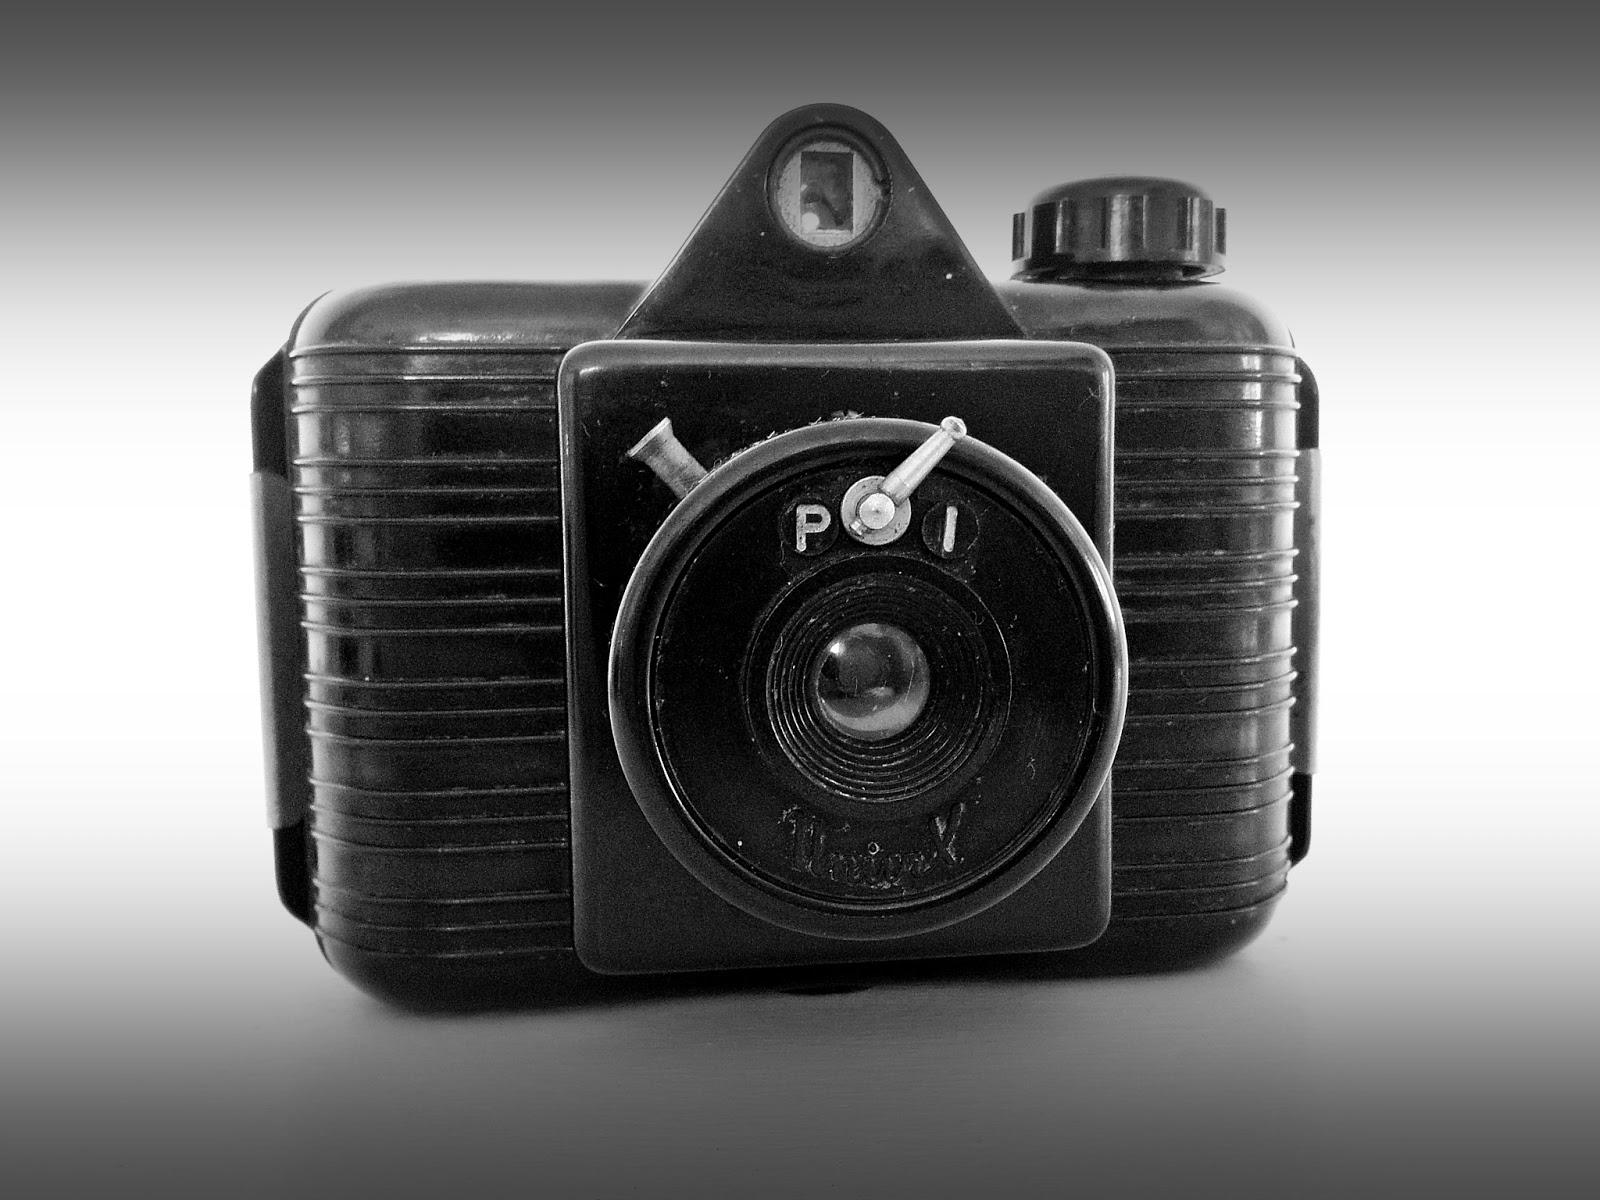 Antique but chic c maras de fotos antiguas antique - Camaras fotos antiguas ...